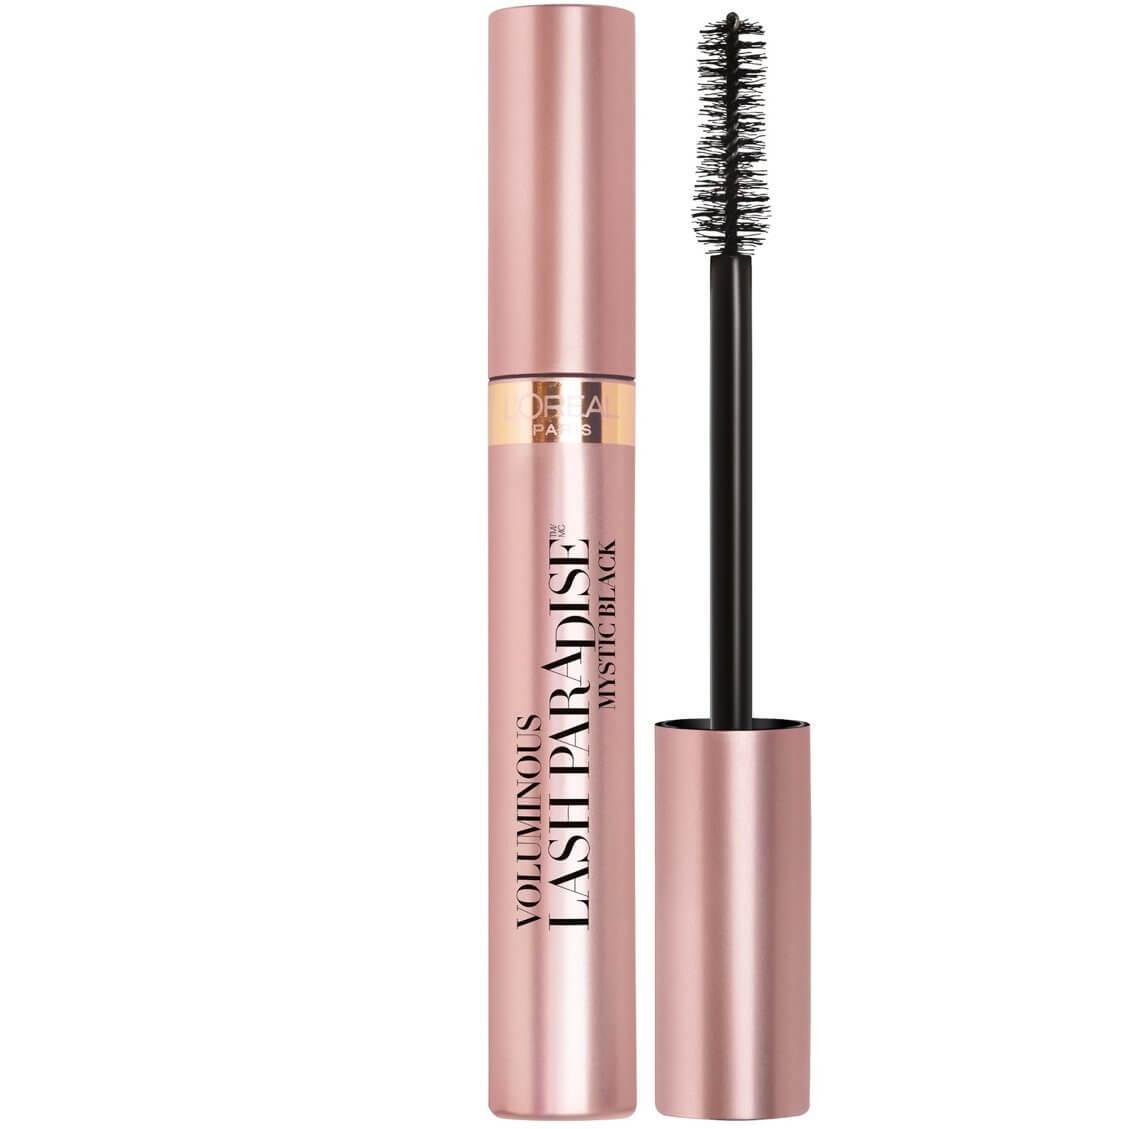 A makeup essential - Loreal Voluminous Lash Paradise Mascara